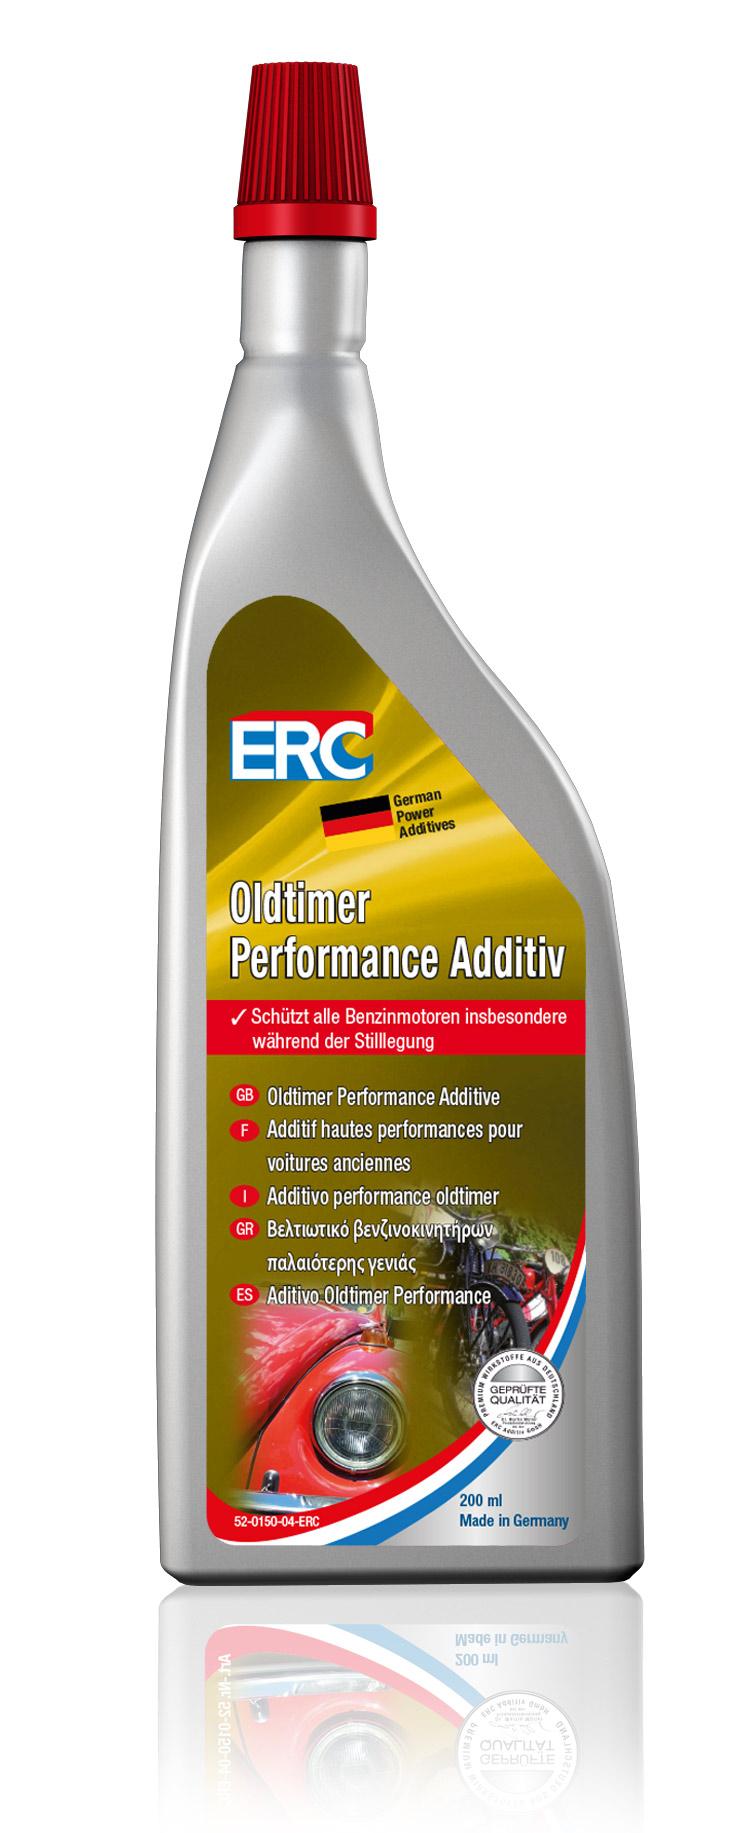 1 x 200 ml ERC Benzinzusatz Oldtimer Performance Additiv (Antikorrosion)